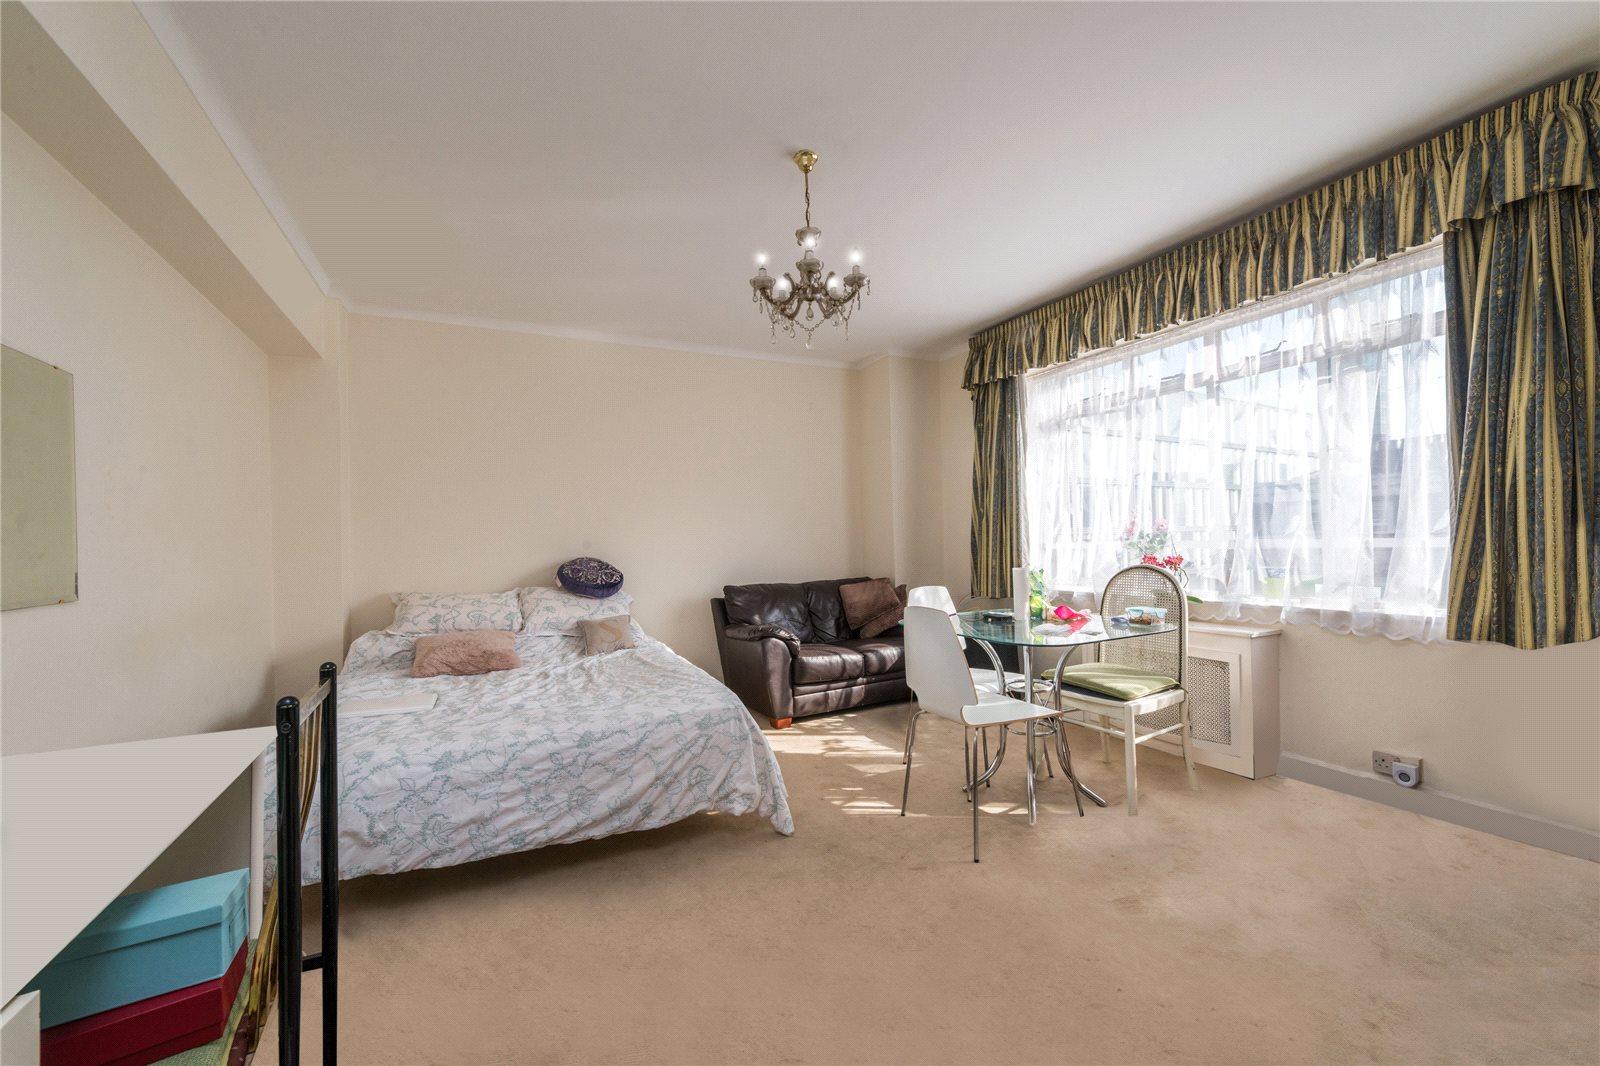 1 Bedroom Apartment For Sale Paramount Court University Street Fitzrovia Wc1e 6jp